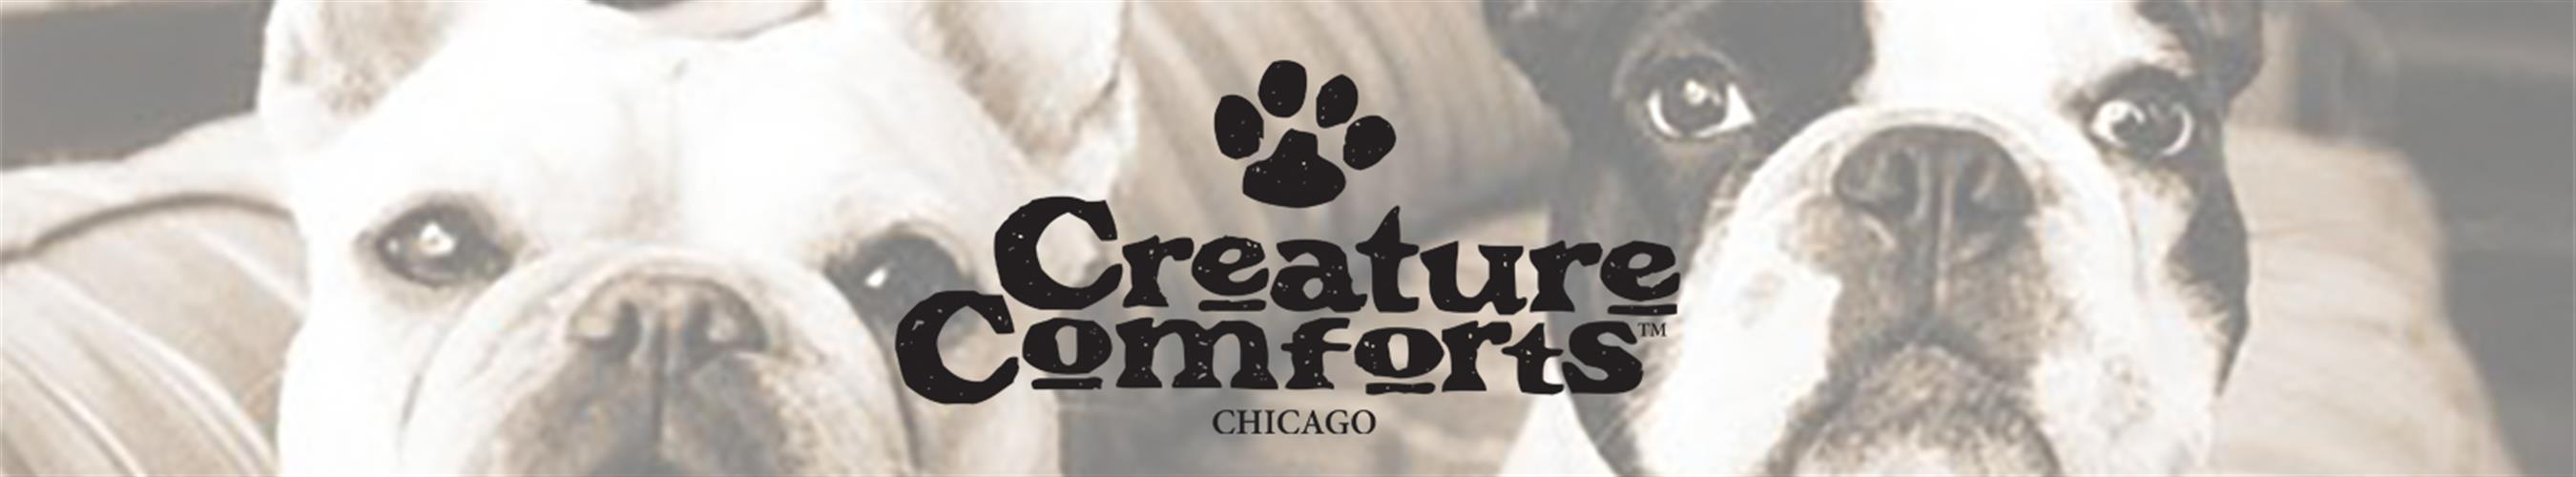 Creature Comforts™